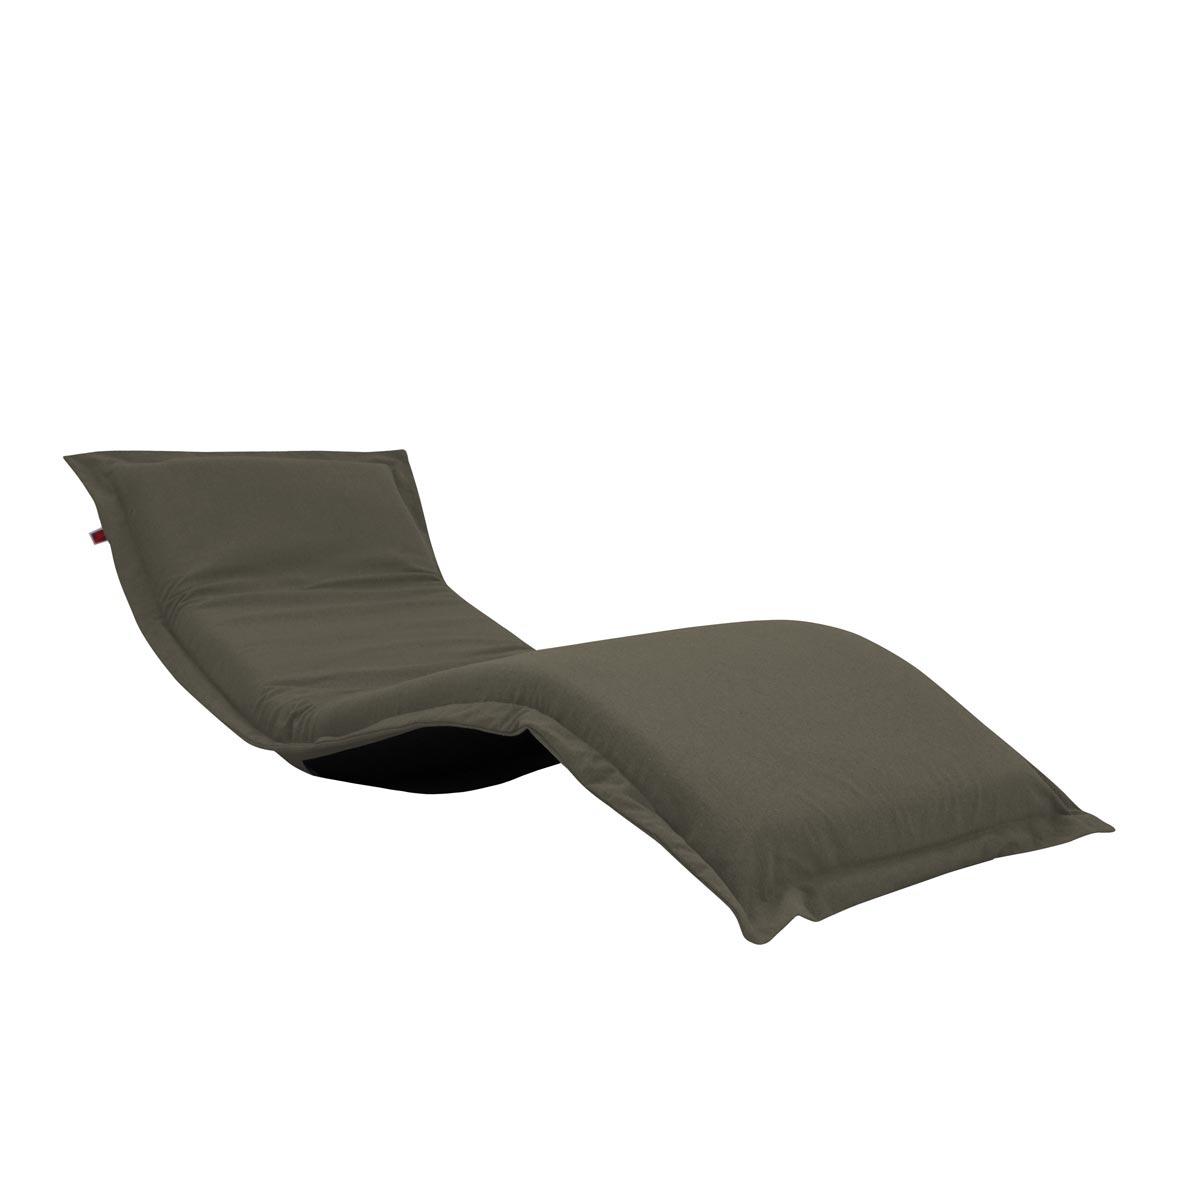 Pufe ClicClac Uno Lounge Tecido Ecolona Caqui 02 05